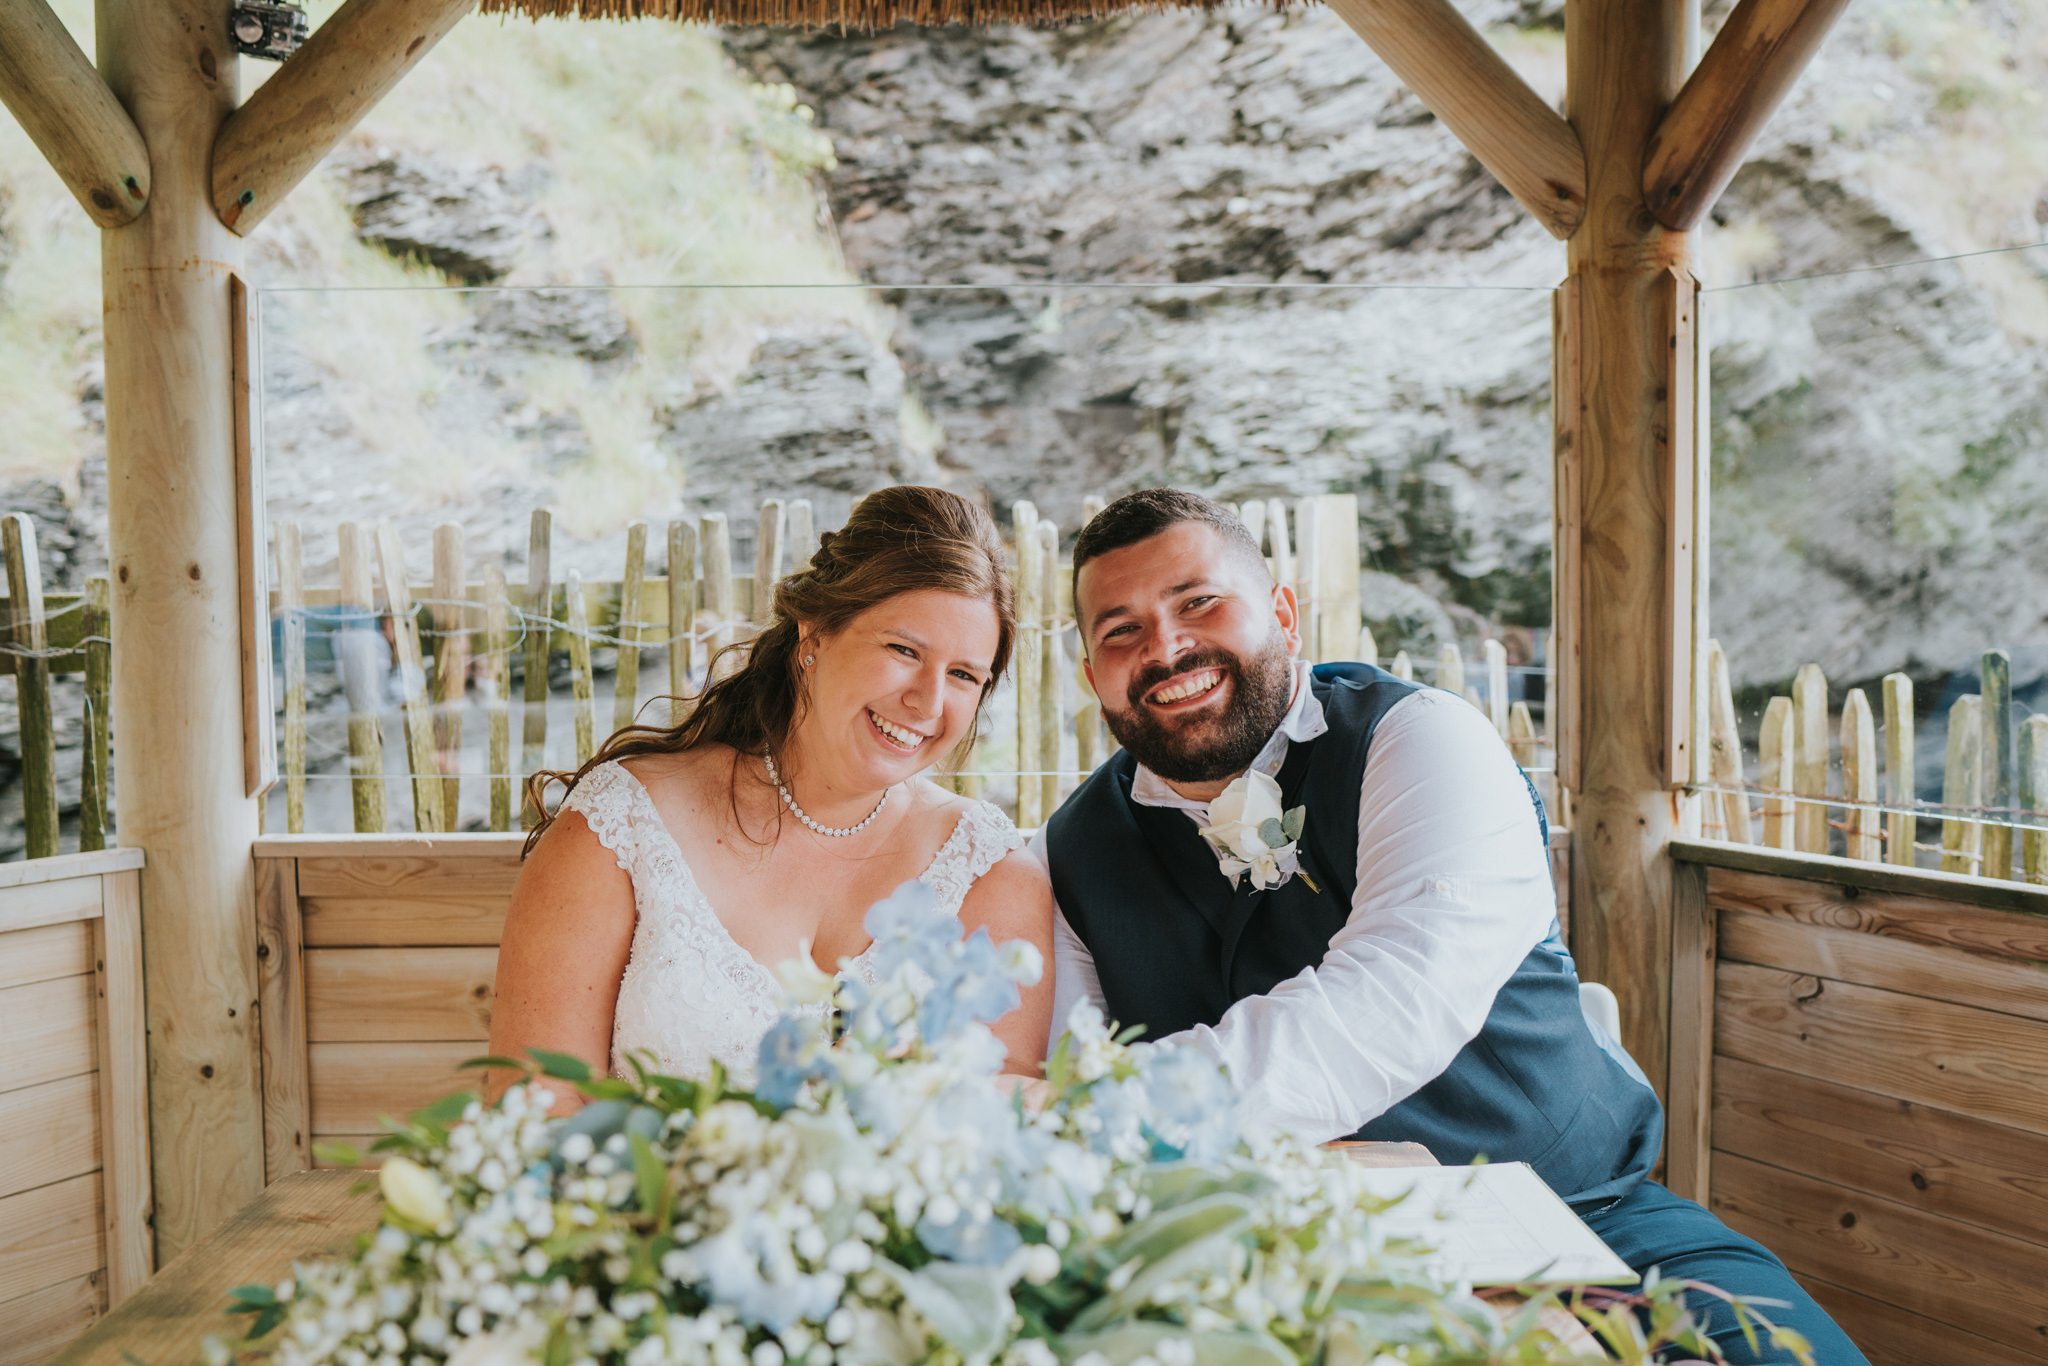 john-amy-relaxed-beach-wedding-tunnels-beaches-ilfracombe-north-devon-grace-elizabeth-colchester-essex-alternative-relaxed-wedding-photography-devon-suffolk-norfolk-essex (66 of 159).jpg